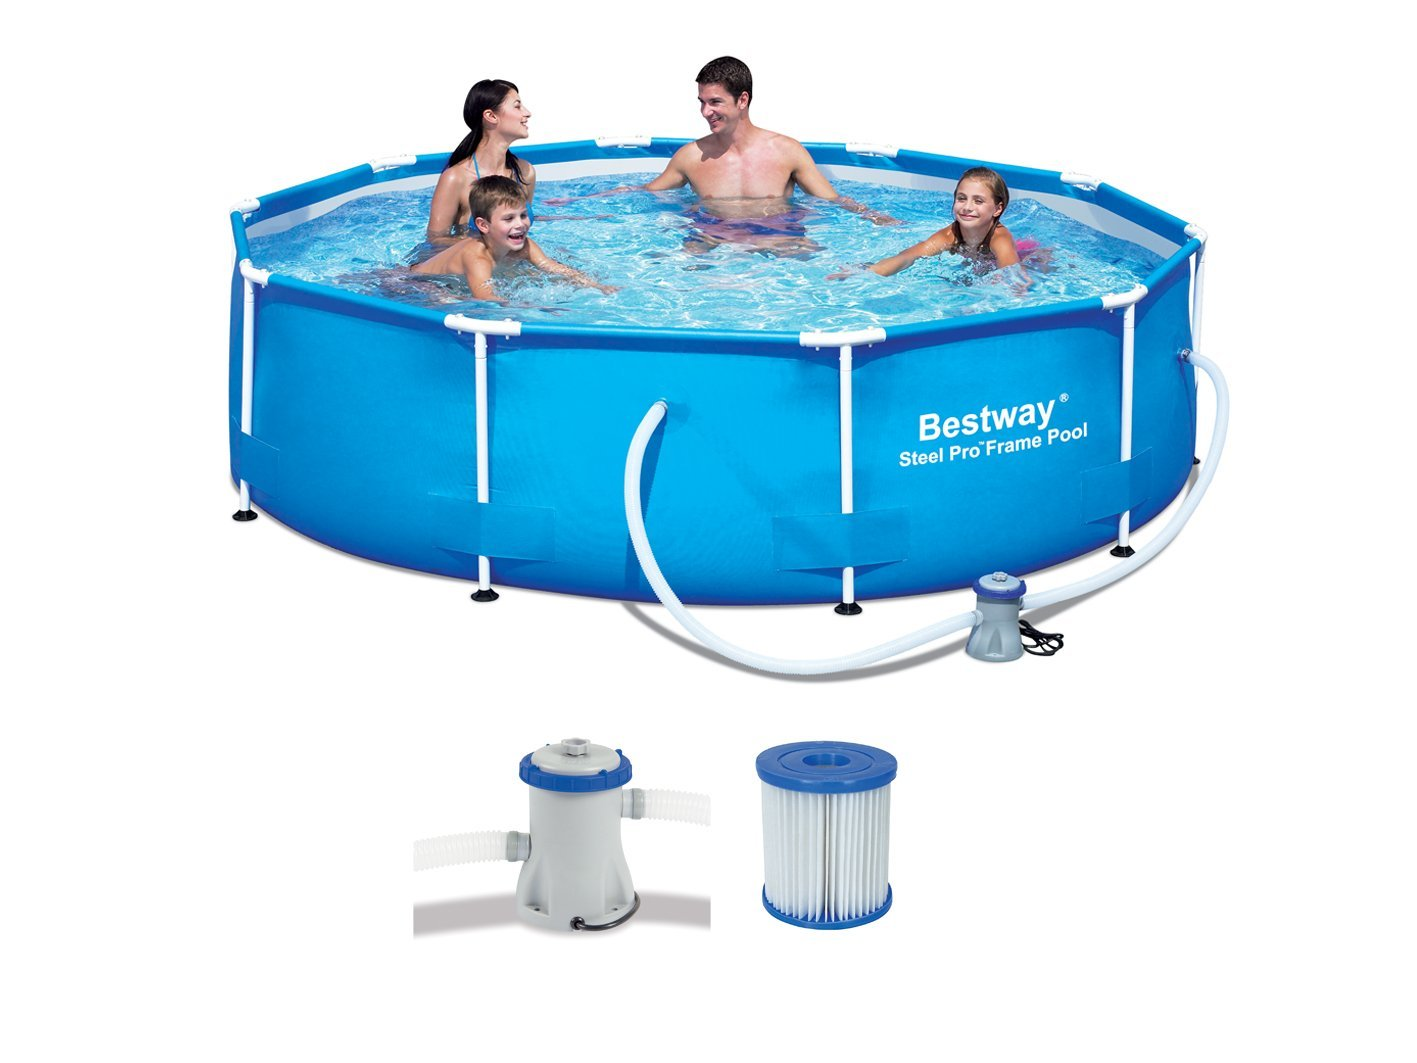 Pool Angebot ++ Test ++ NEU - schwimminsel24.de